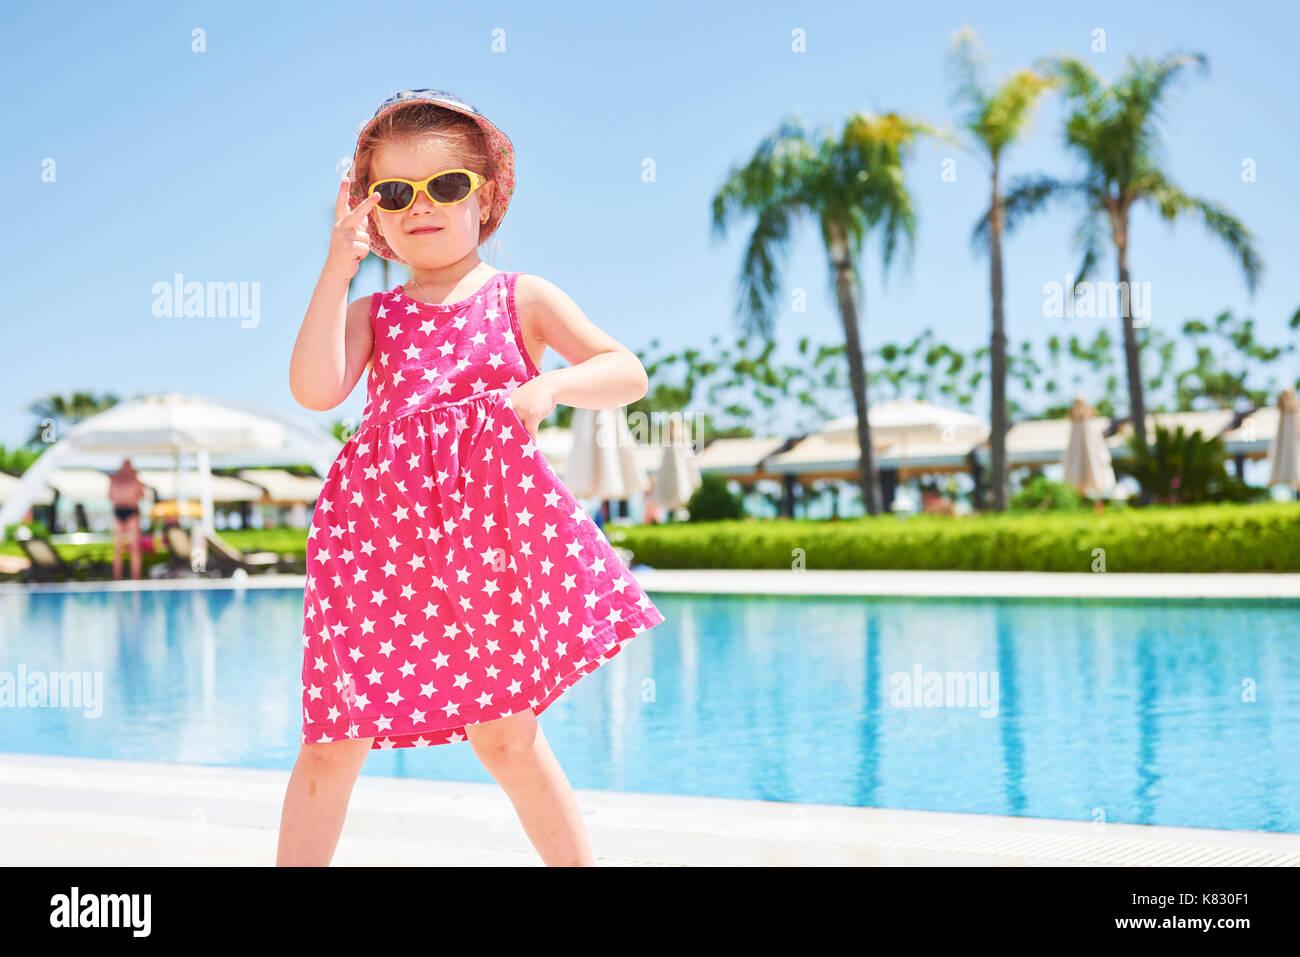 Portrait of a happy girl outdoors in summer day. Amara Dolce Vita Luxury Hotel. Resort. Tekirova-Kemer. Turkey. - Stock Image